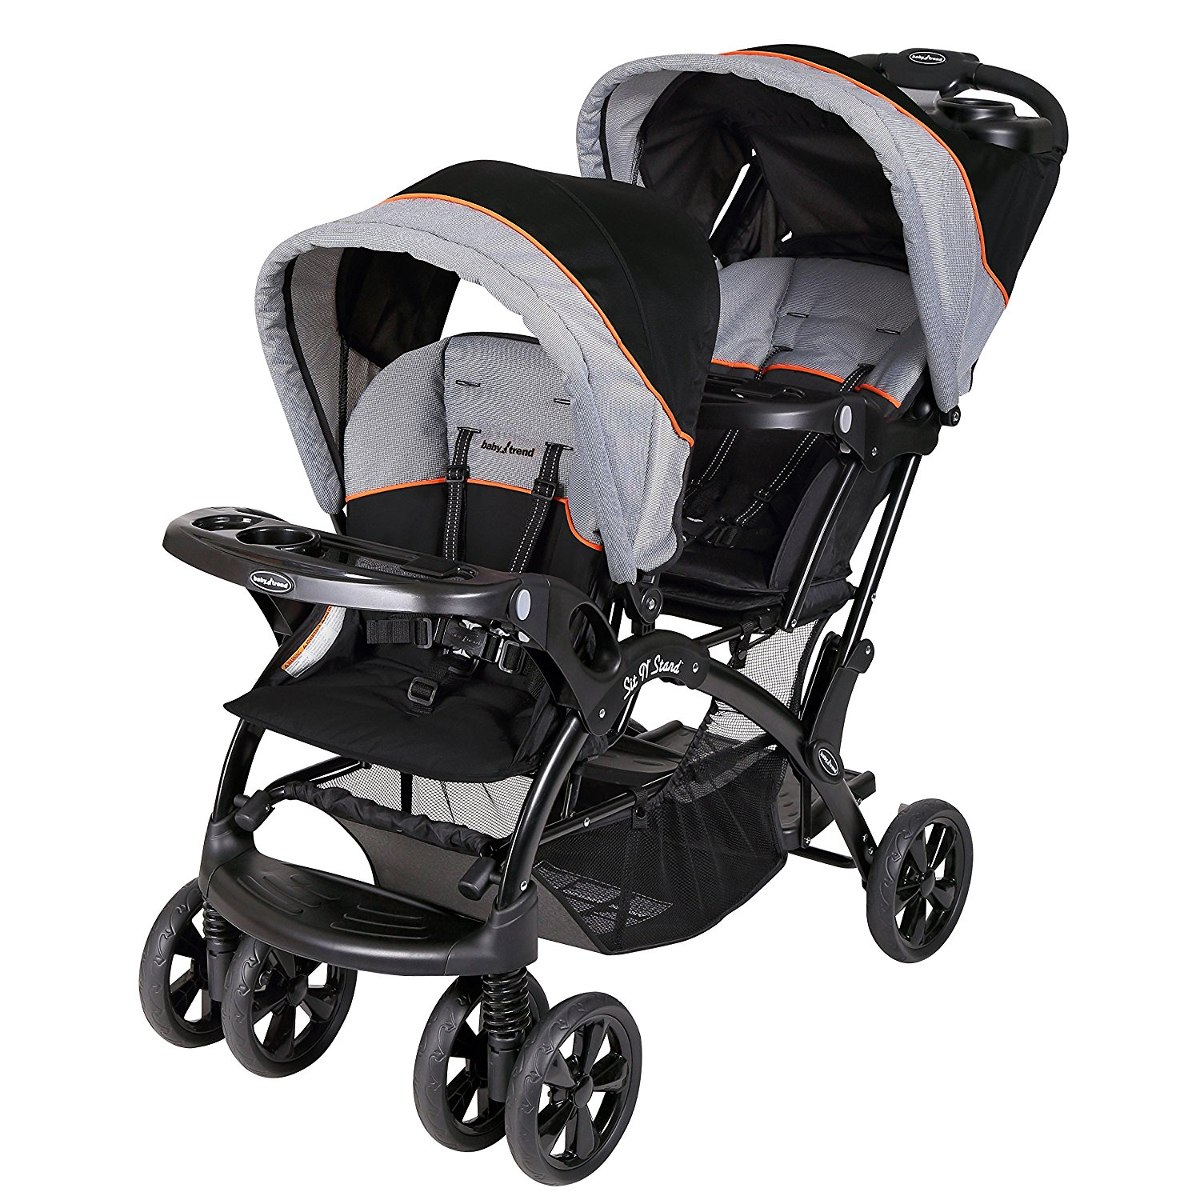 37546c0b4 coche para bebe baby trend sit 'n levante coche doble, mille. Cargando zoom.